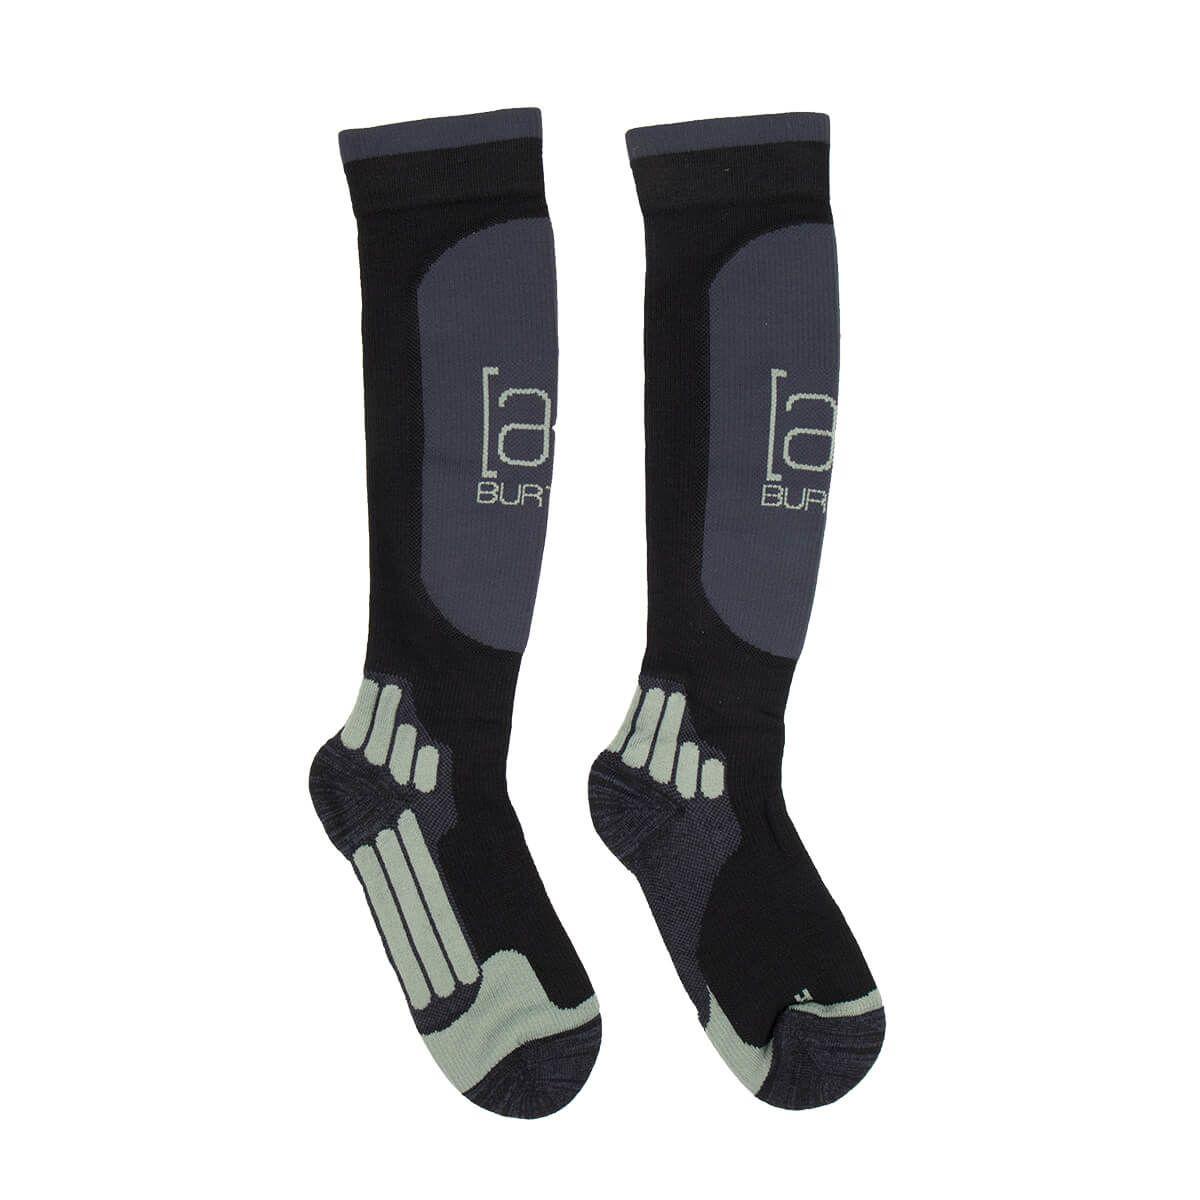 BURTON Endurance Snowboard Socks in Black